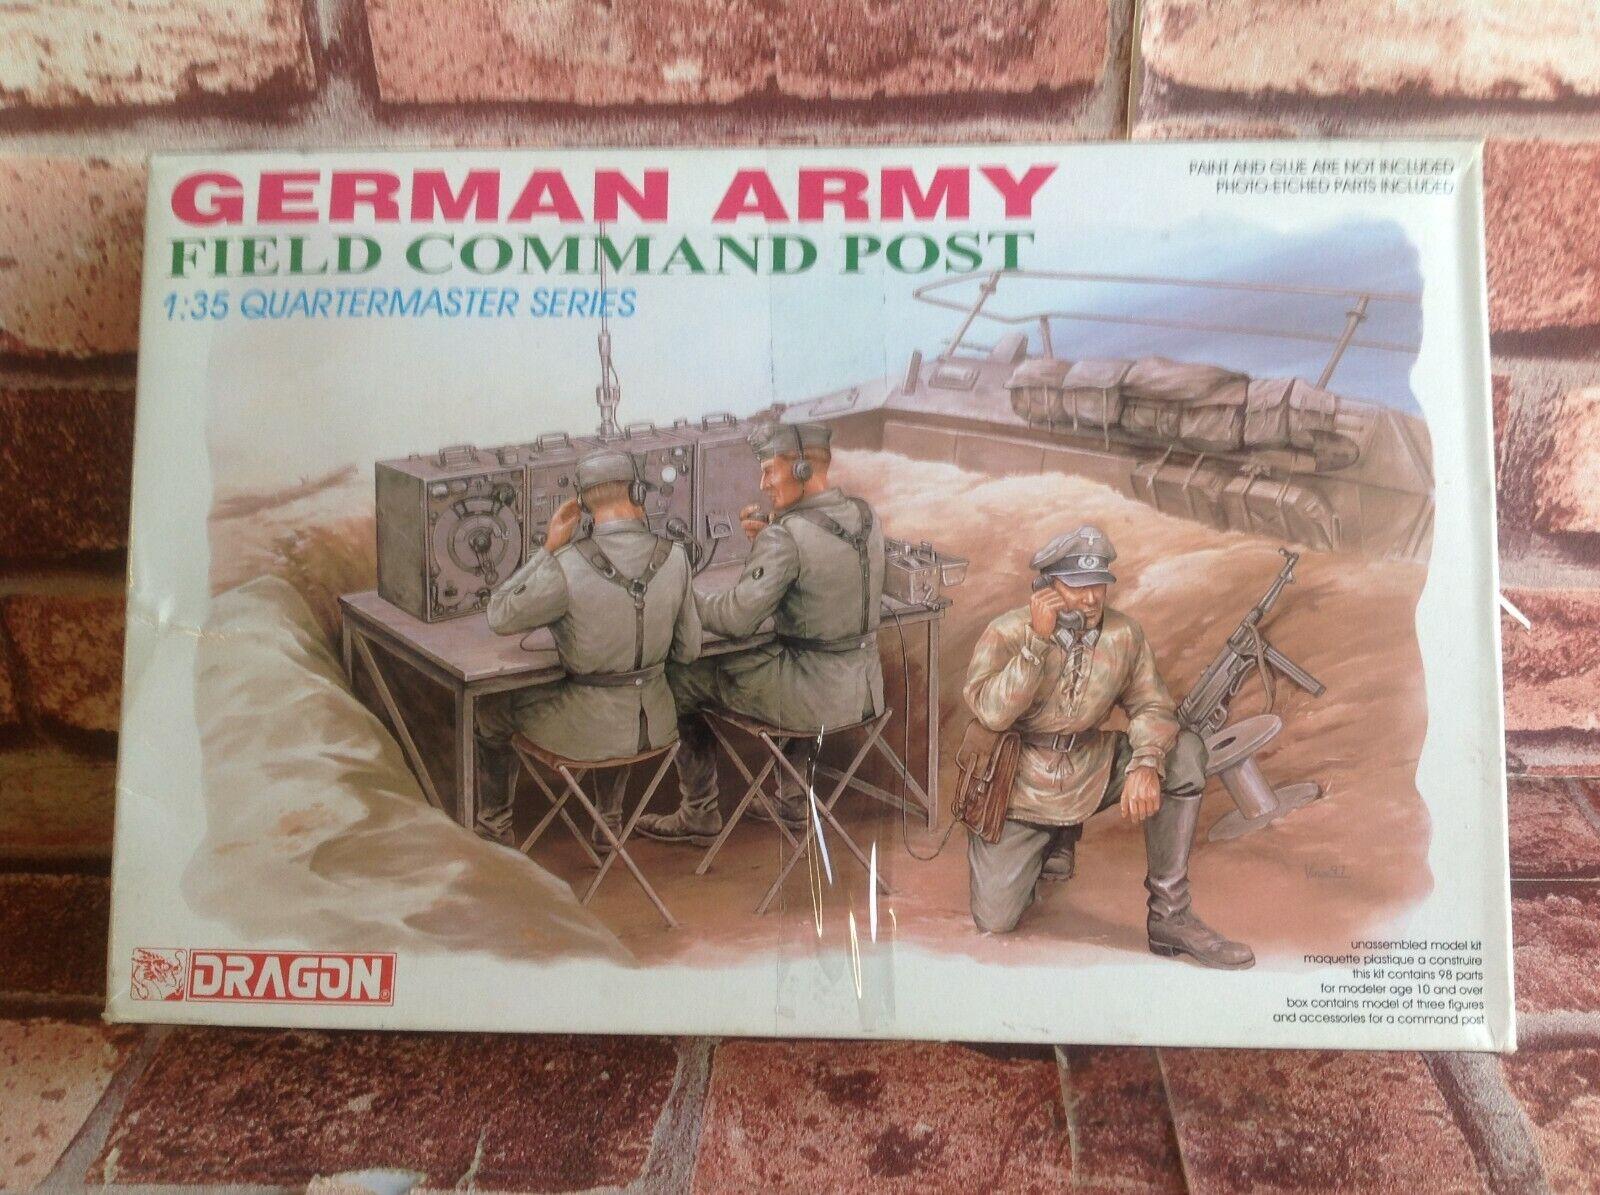 DRAGON 1 35 MODEL - GERMAN ARMY FIELD COMMAND POST - QUARTERMASTER SERIES